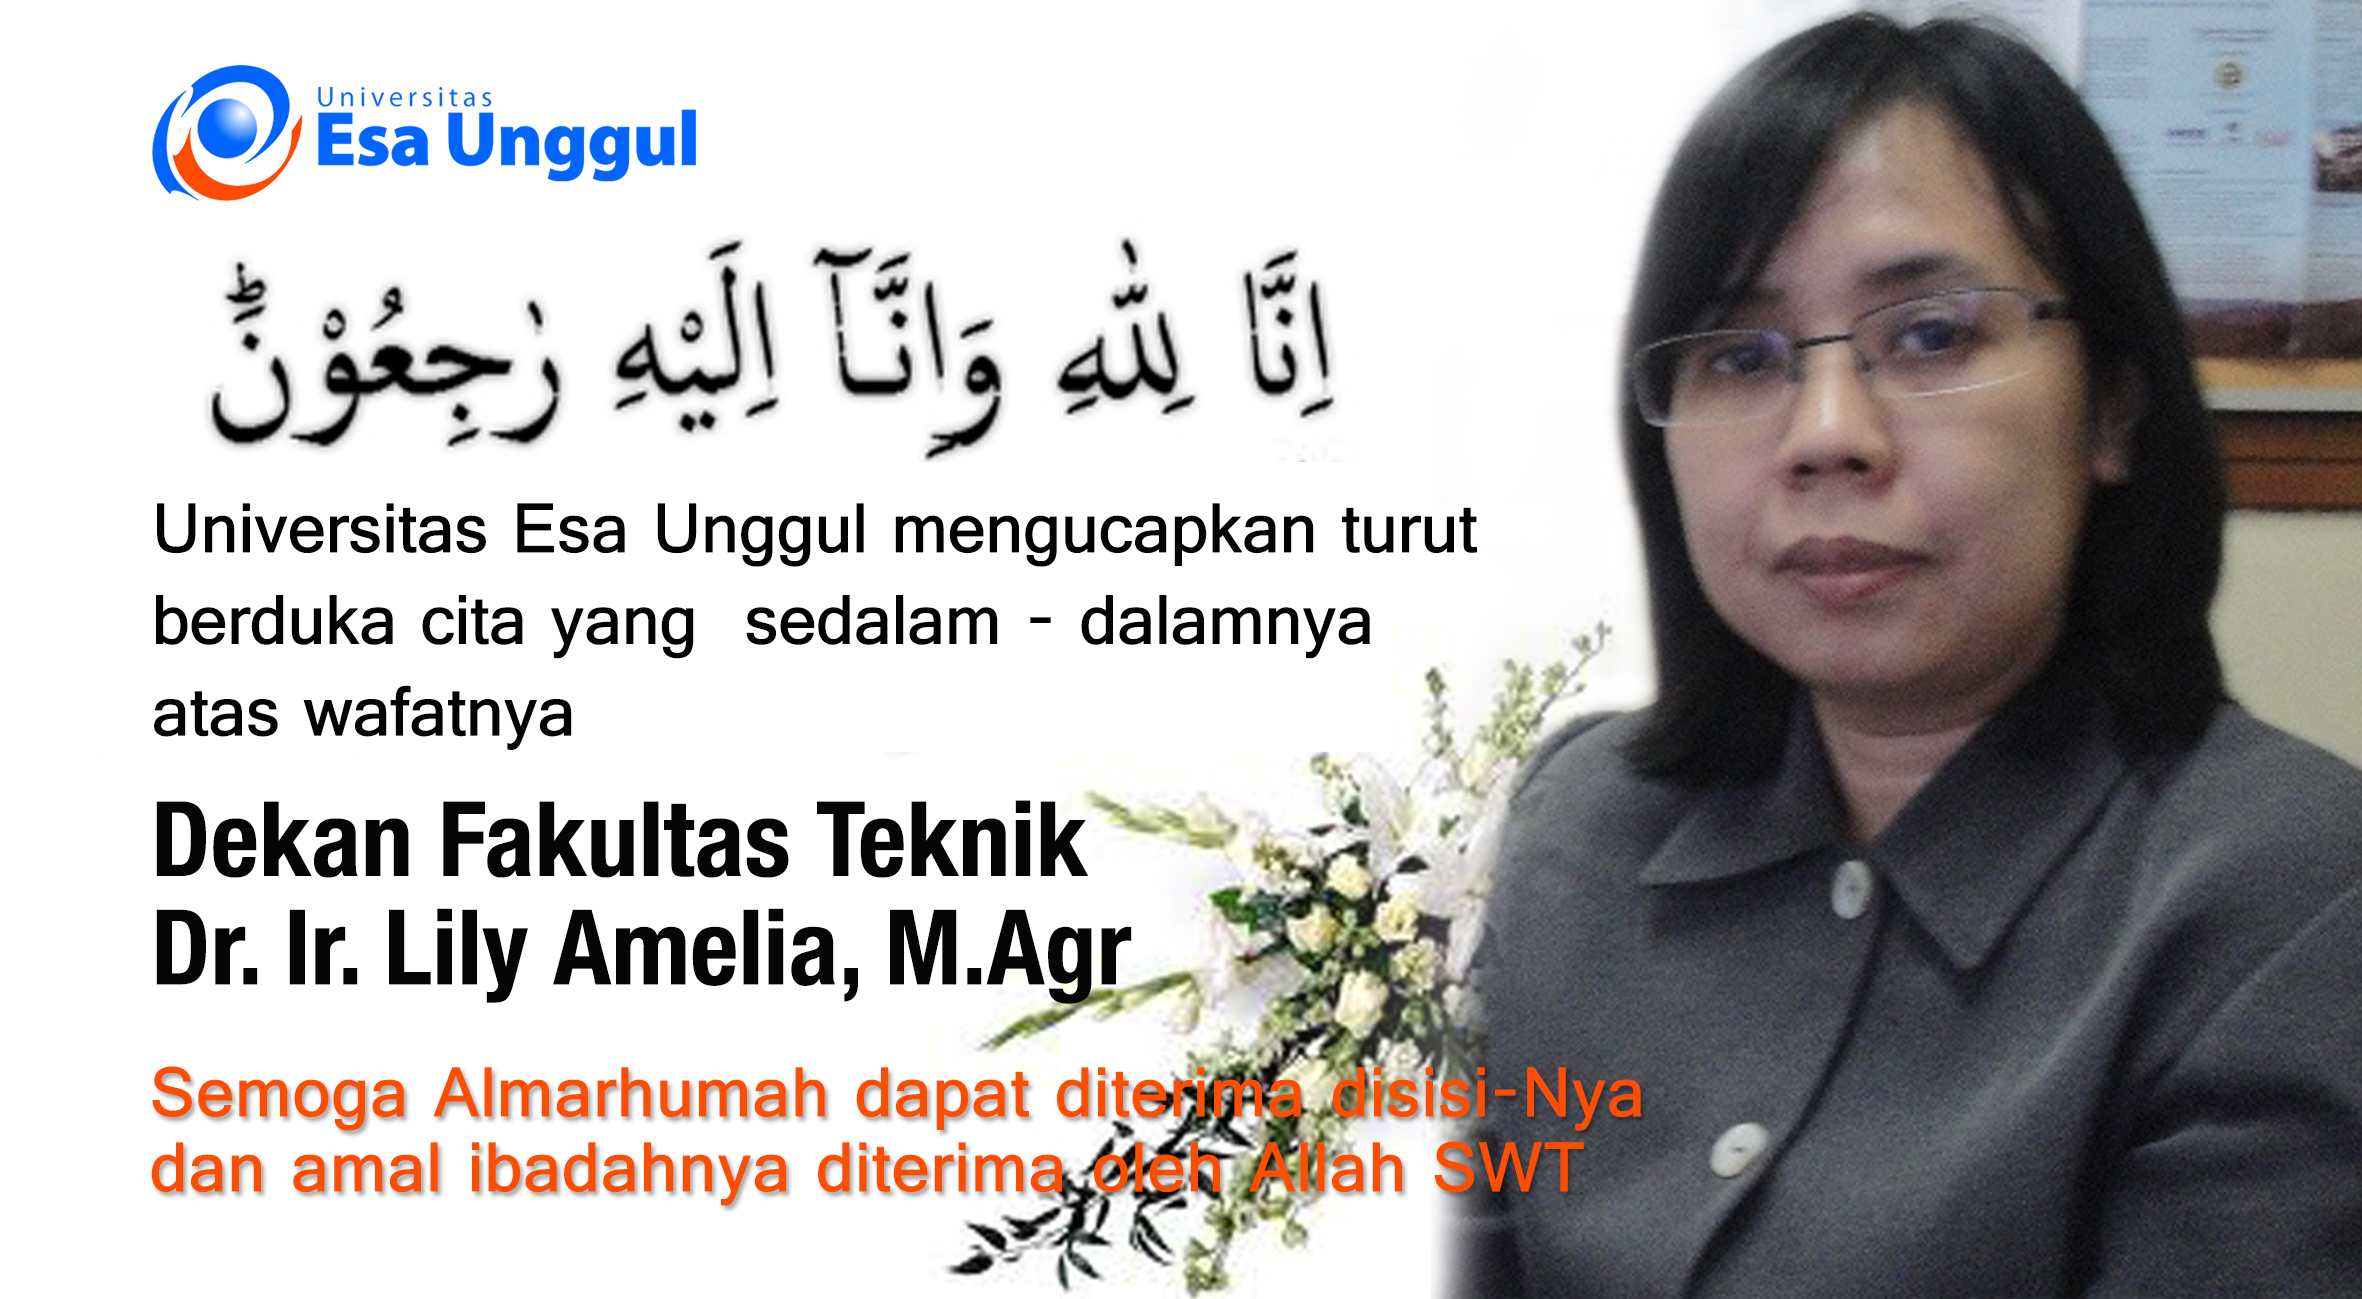 Universitas Esa Unggul mengucapkan turut berduka cita yang sedalam-dalamnya atas wafatnya Dekan Fakultas Teknik Dr. Ir. Lily Amelia, M.Agr